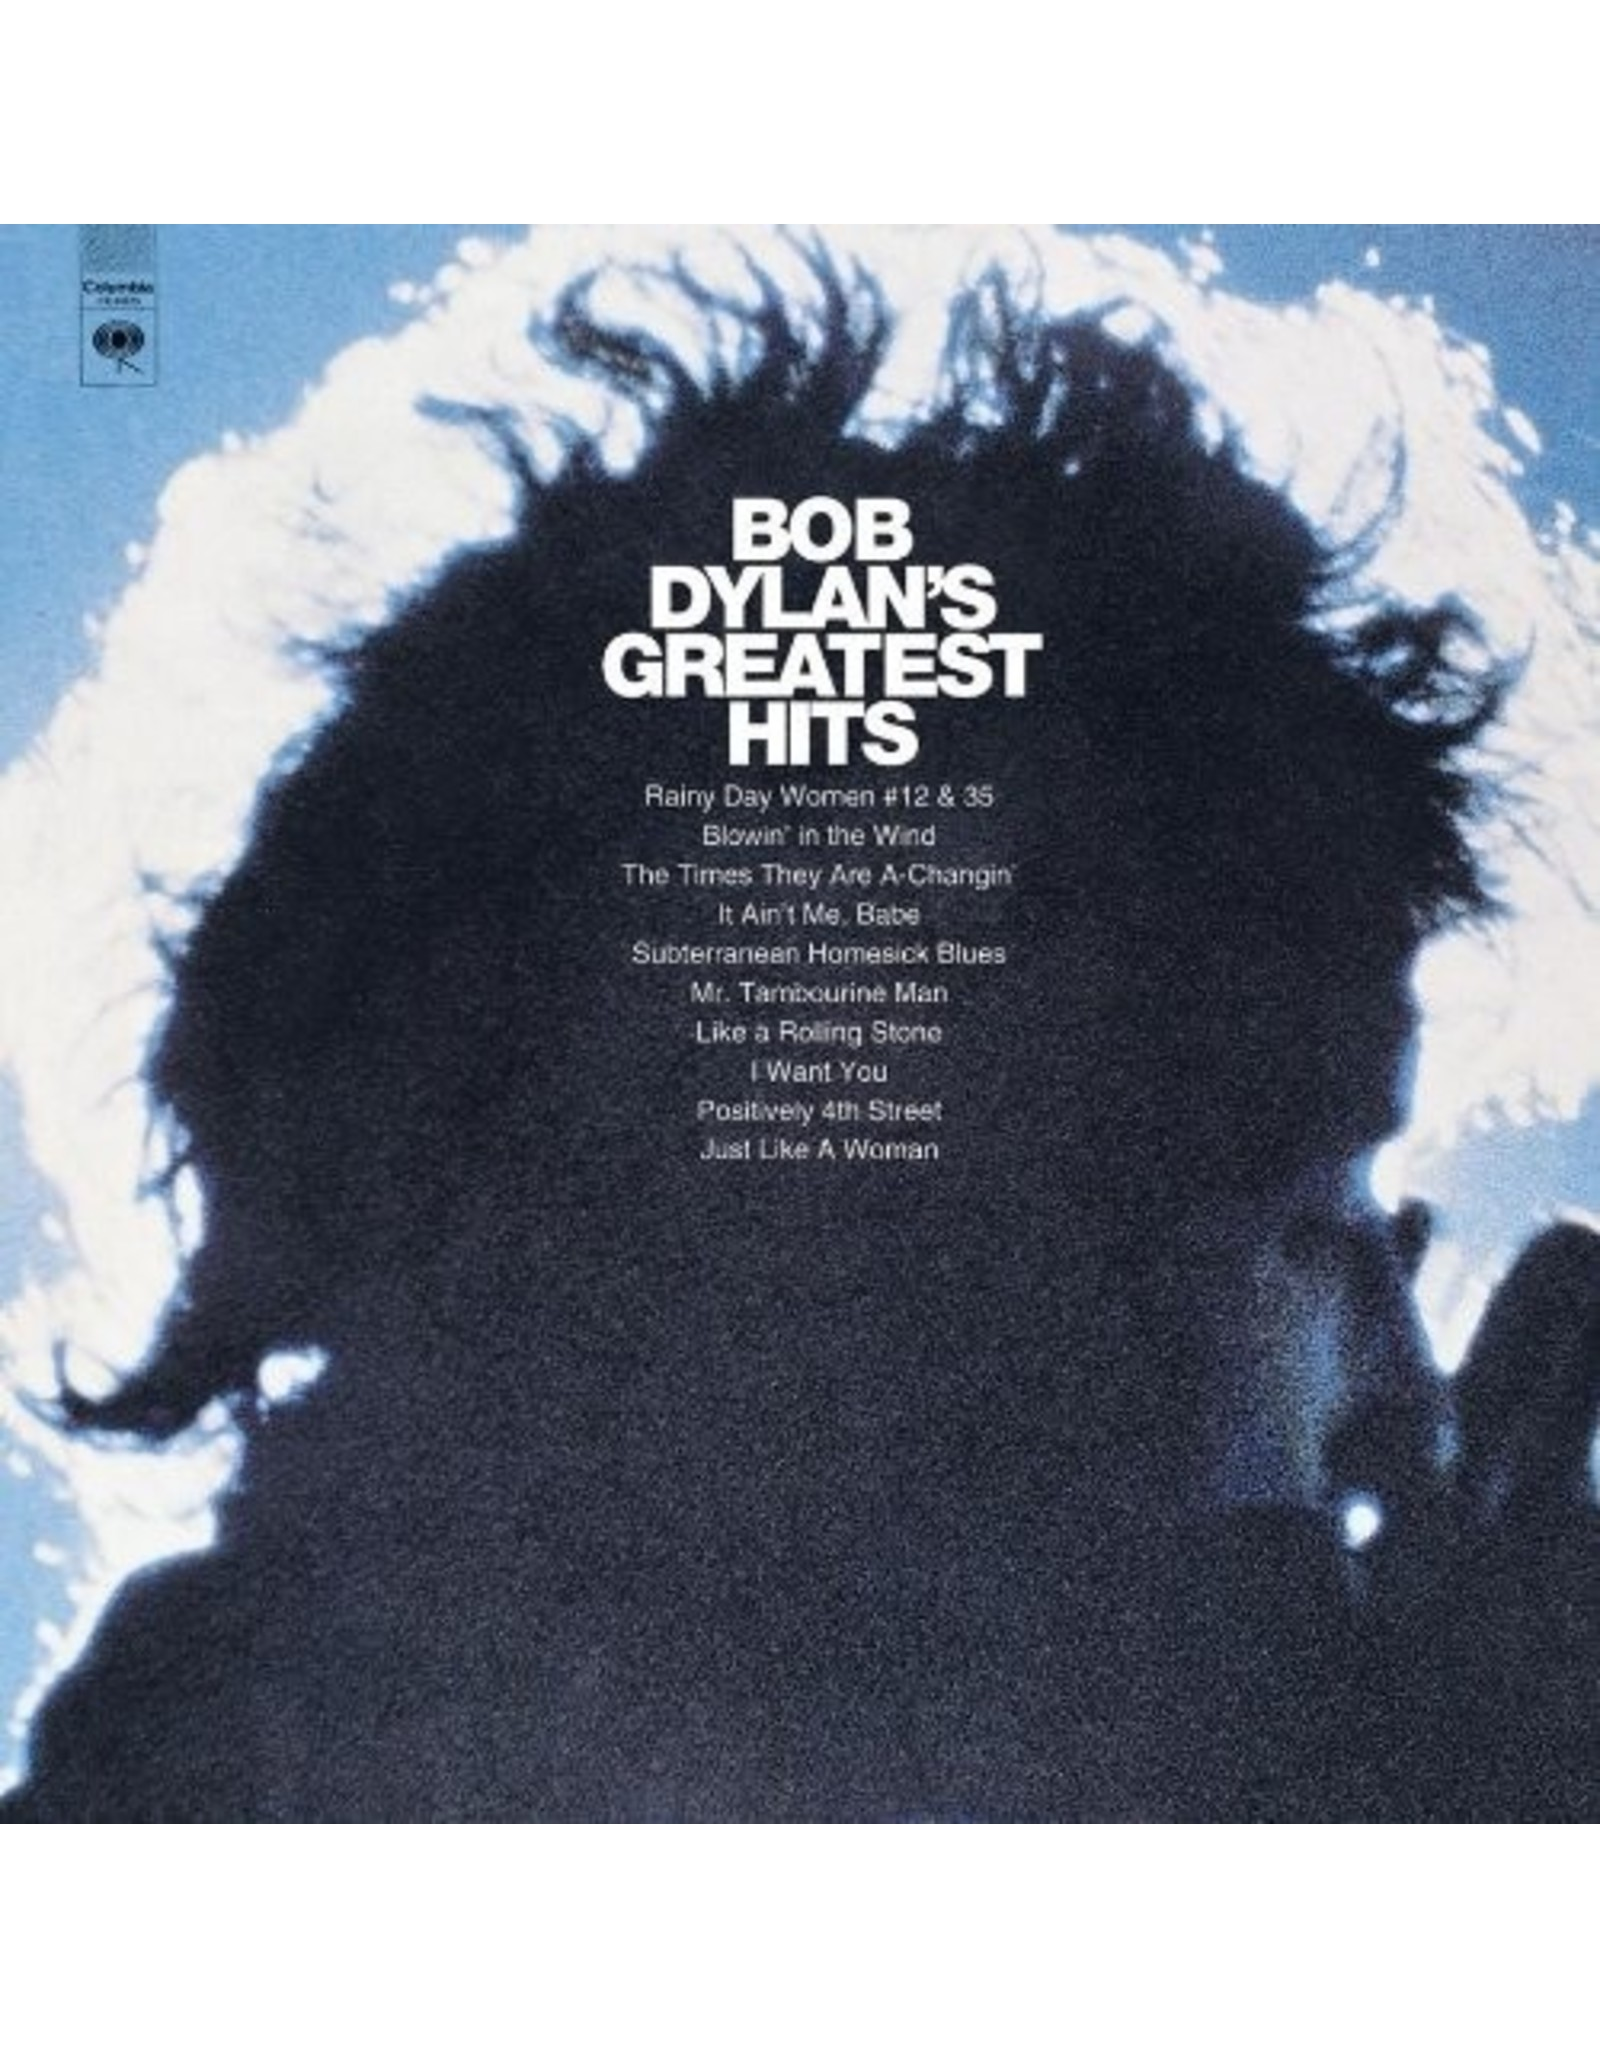 New Vinyl Bob Dylan - Greatest Hits LP